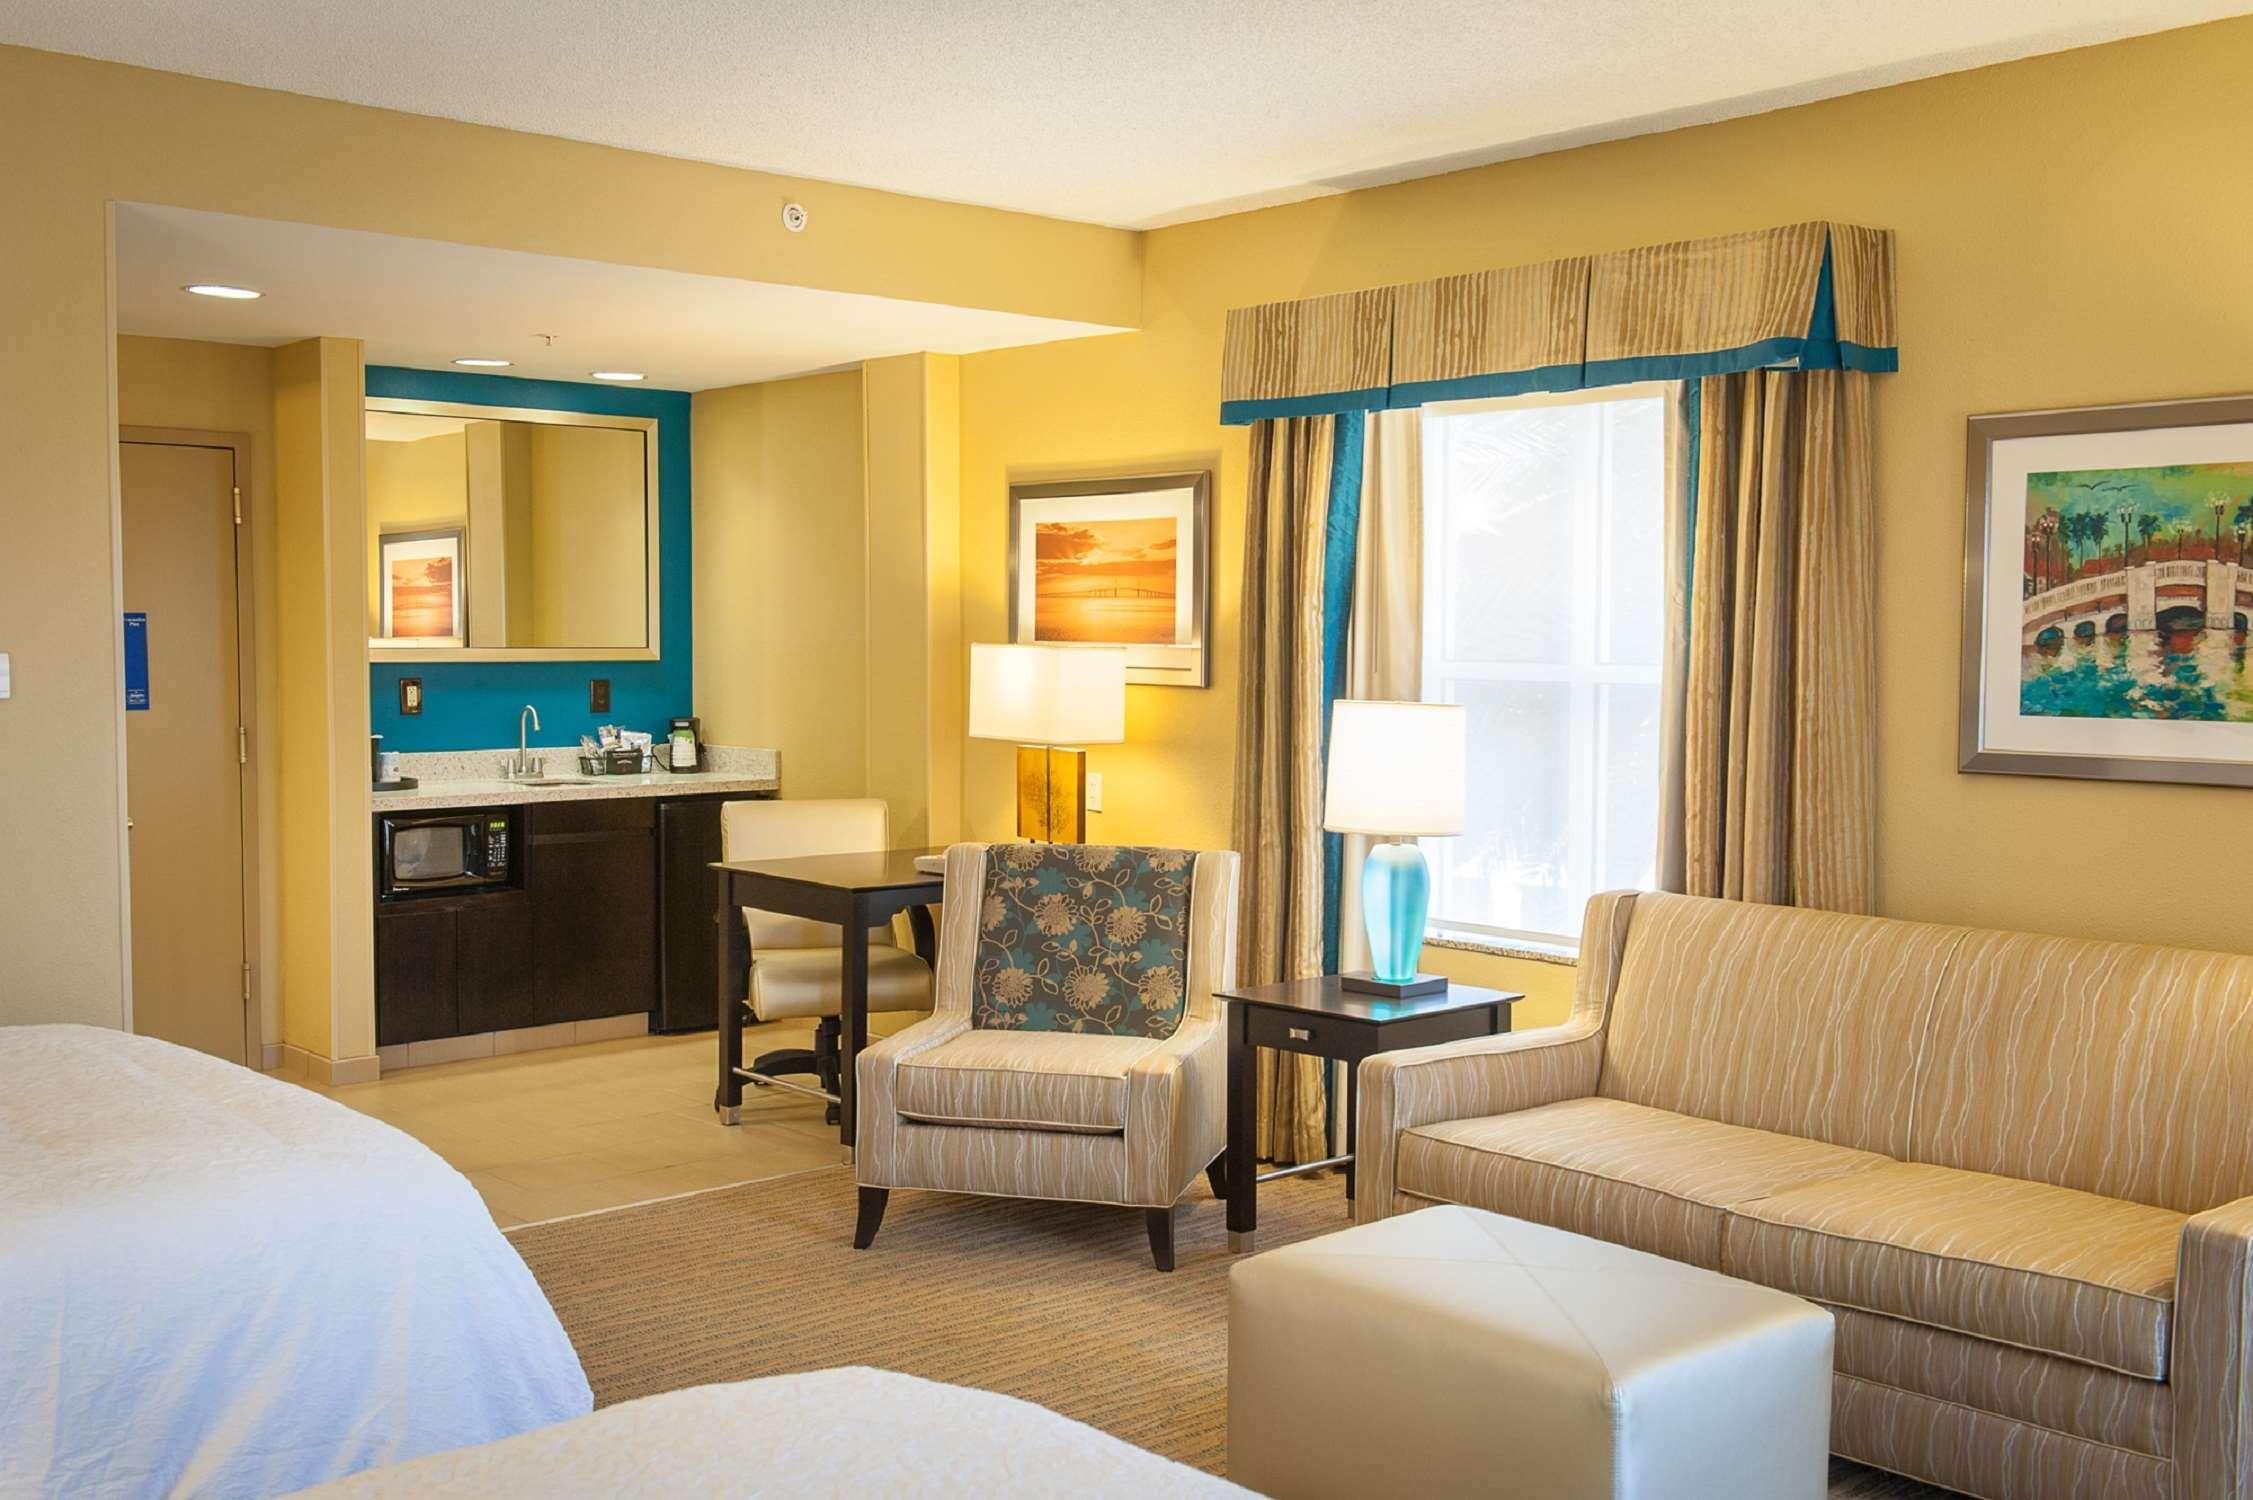 Hampton Inn & Suites St. Petersburg/Downtown image 9